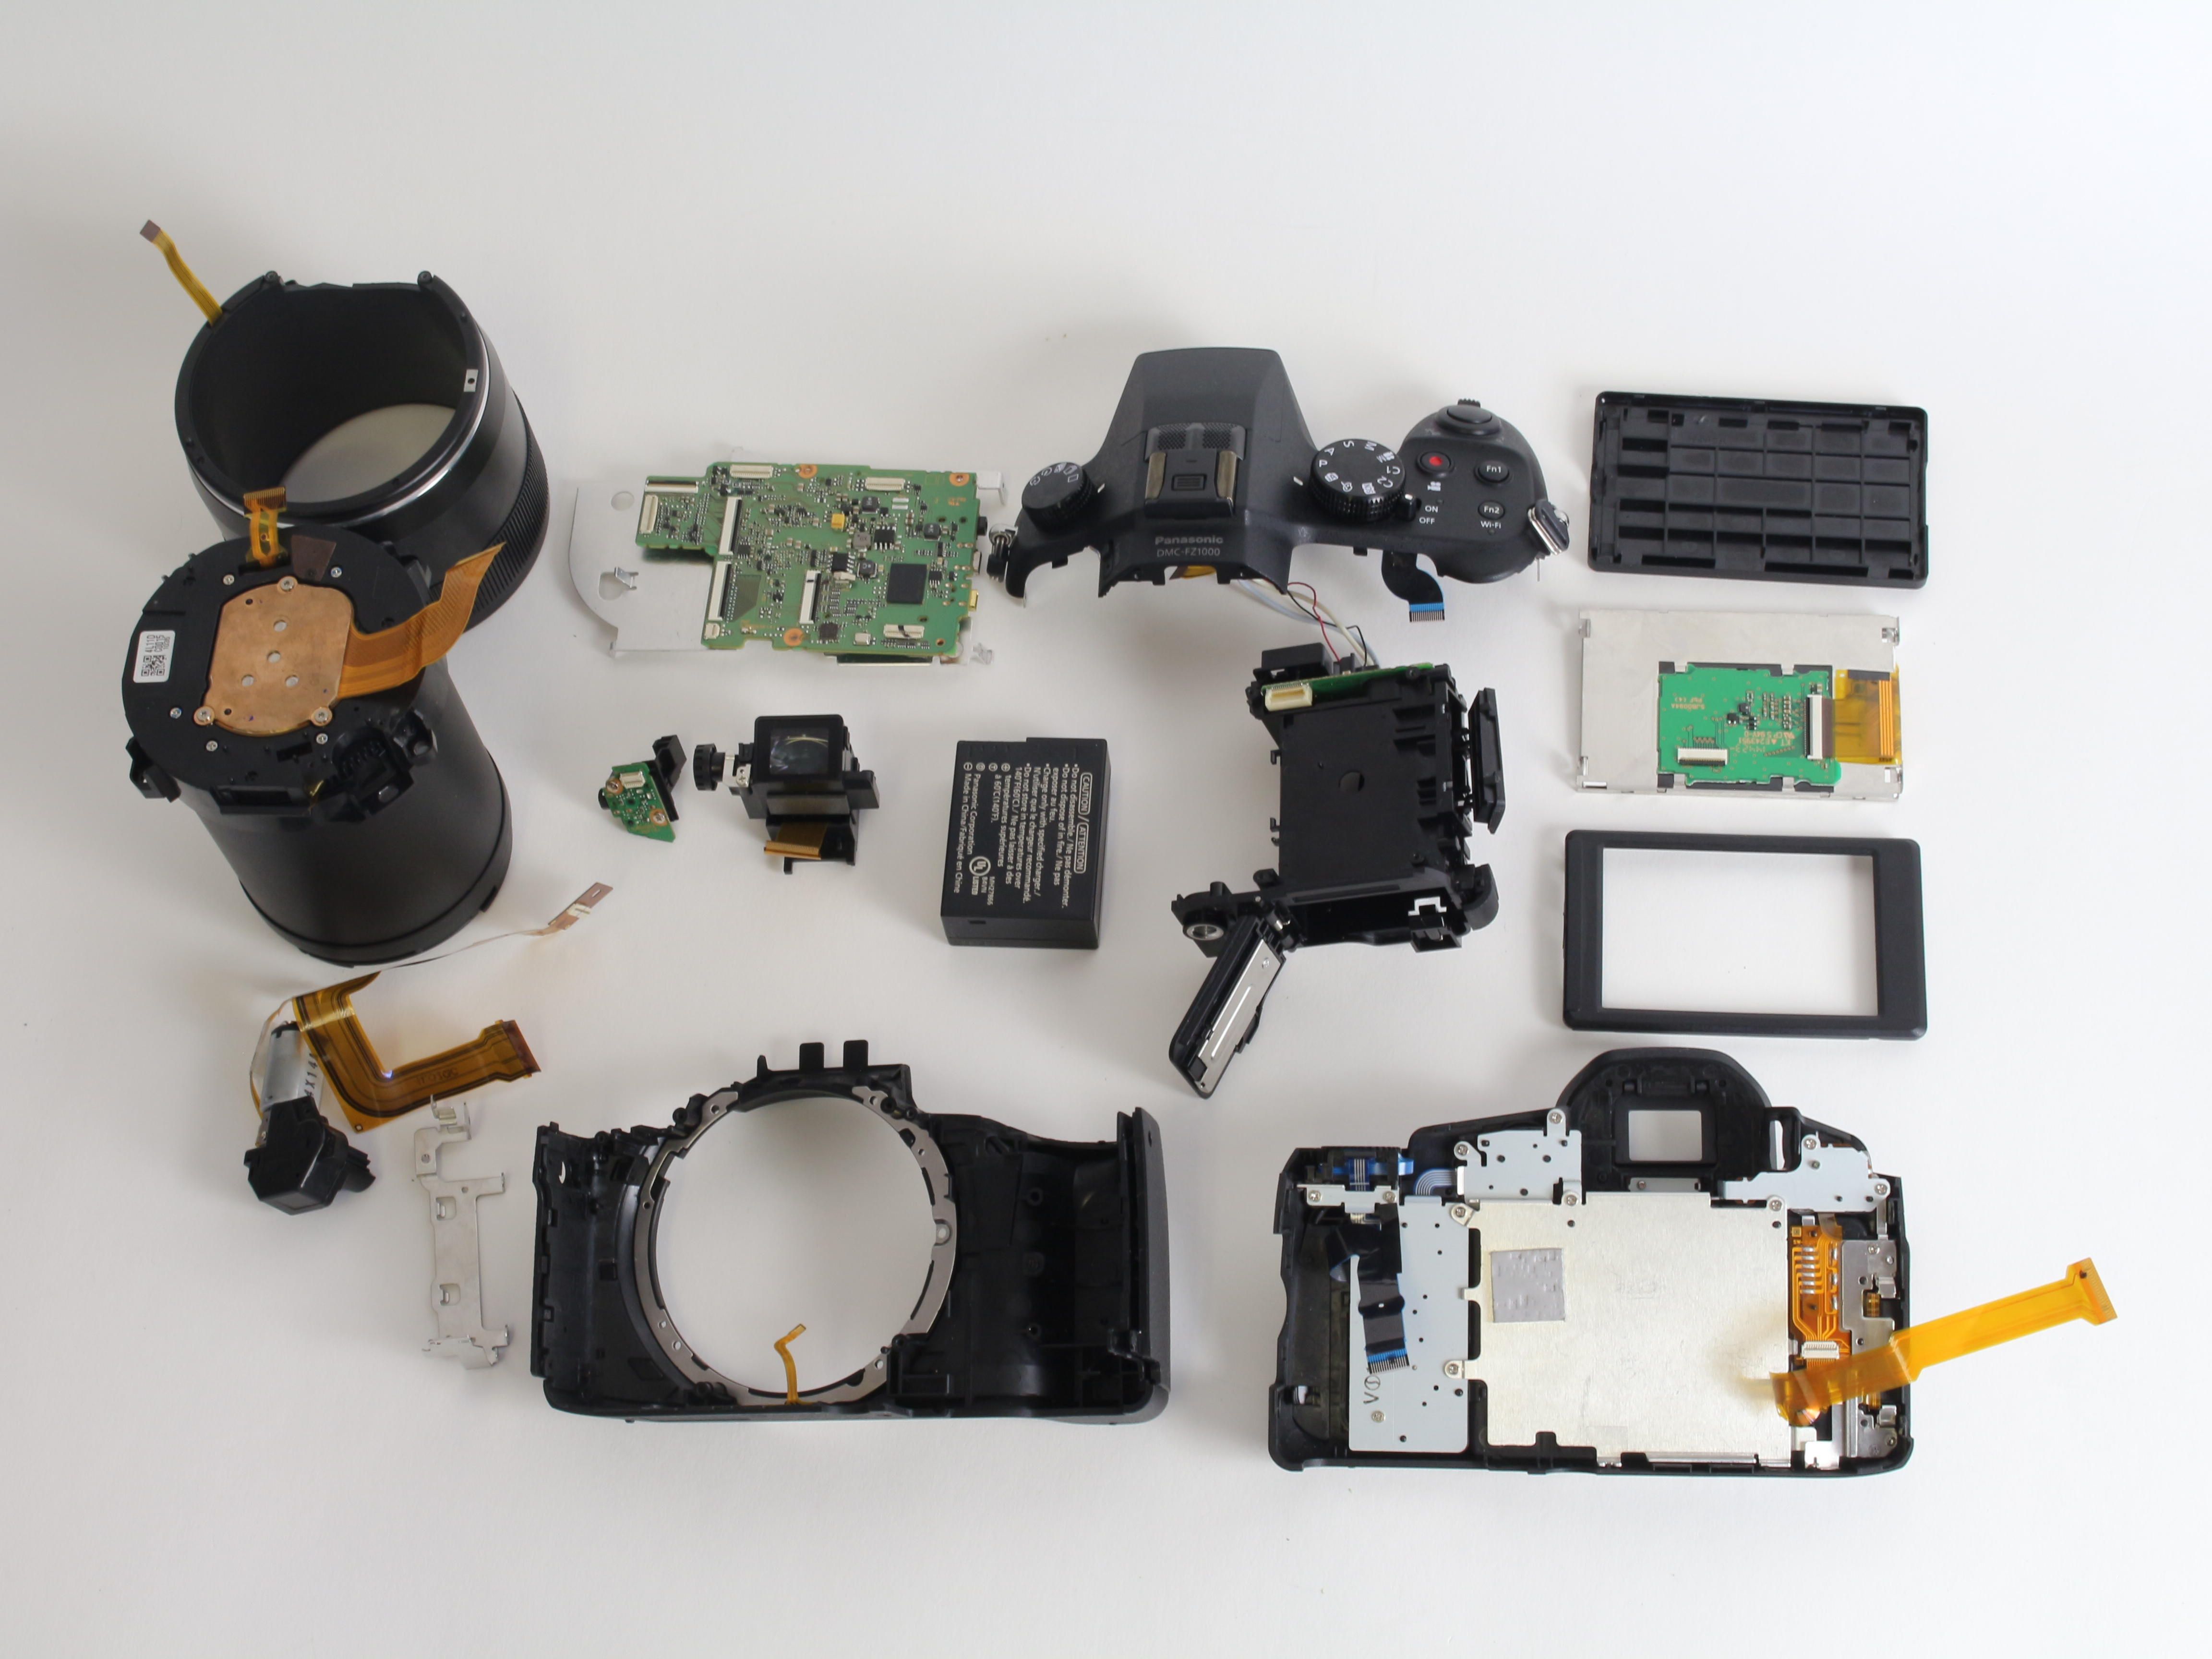 panasonic lumix dmc fz1000 disassembly ifixit repair guide rh ifixit com Panasonic Lumix DMC ZS7 Panasonic Lumix Dmc-Fz1000